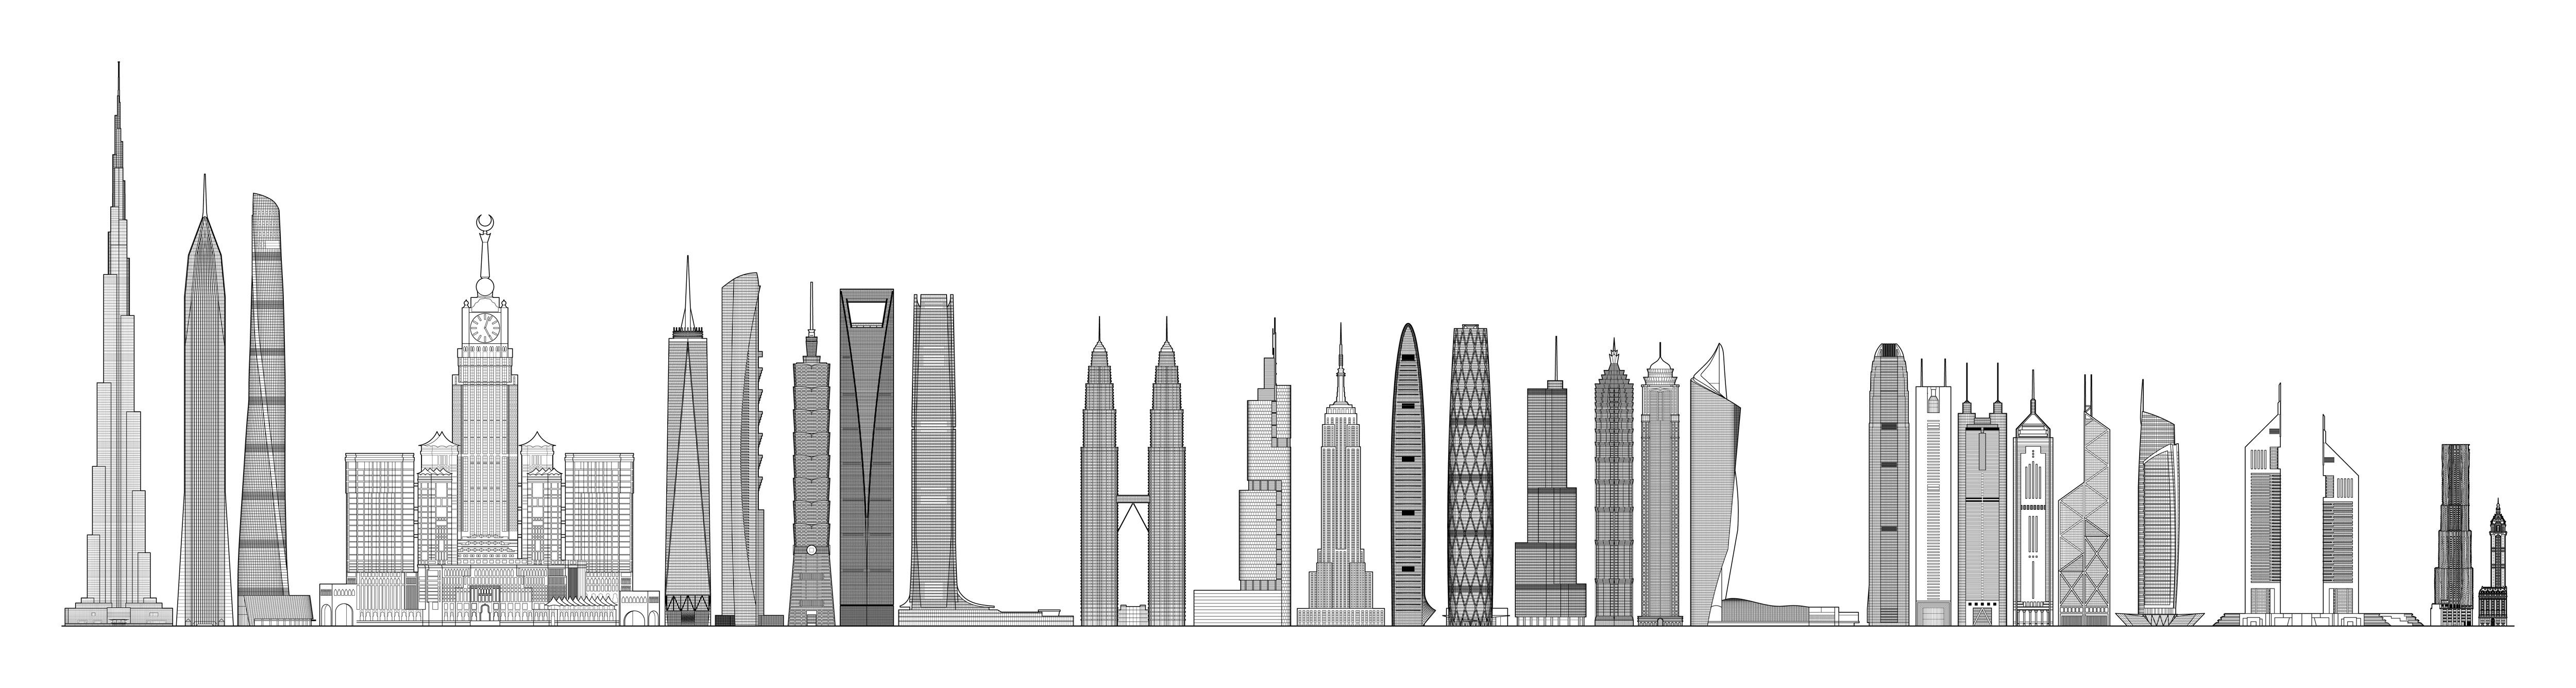 Drawn scenery city building Image pixels) jpg 1335 (JPEG